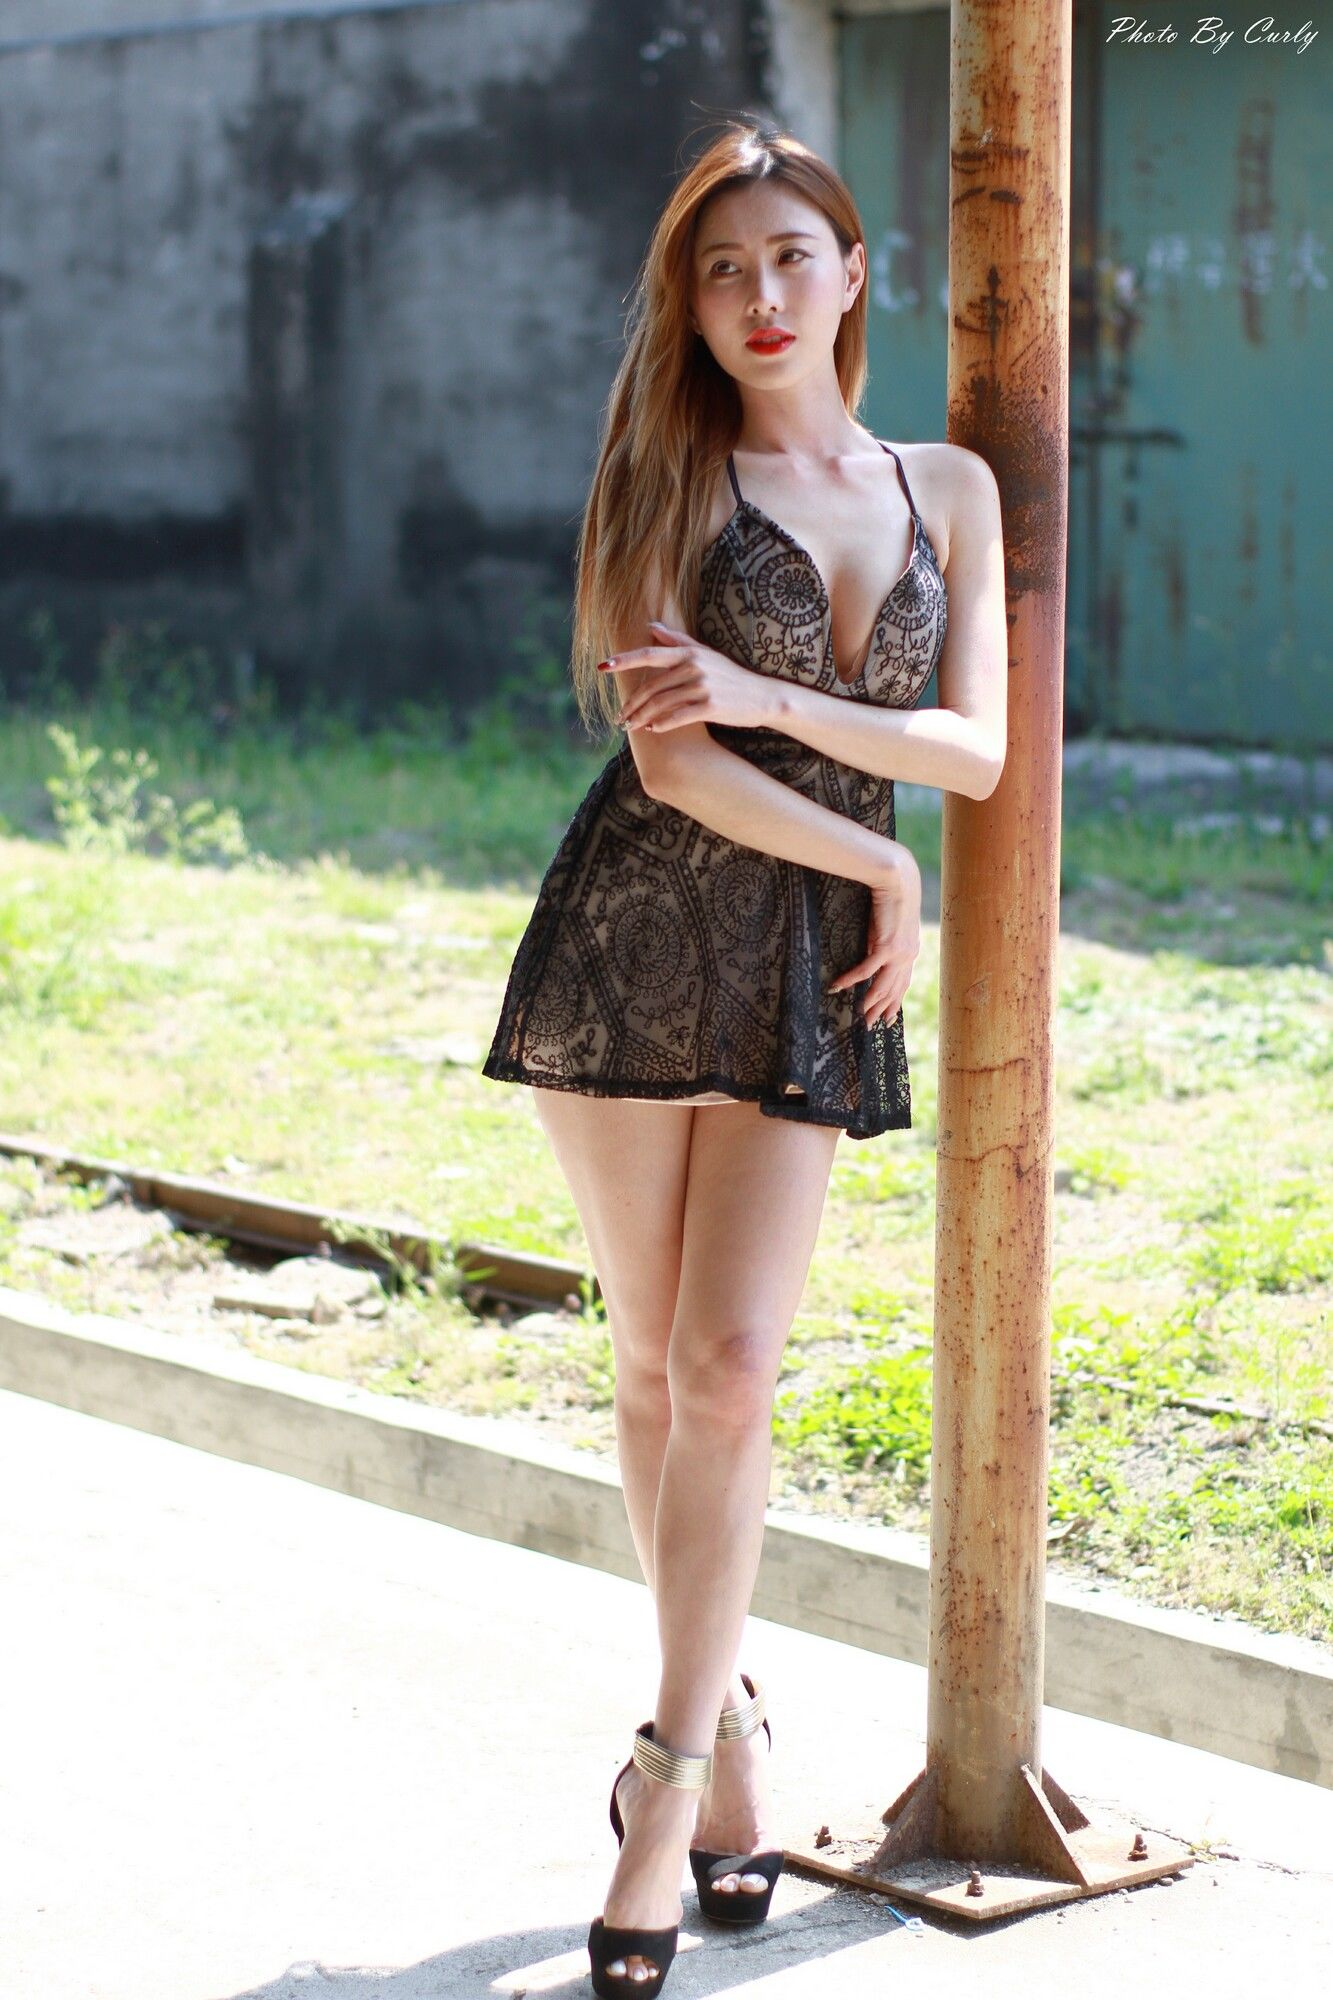 VOL.1700 [台湾正妹]女神御姐长腿美女:黄艾比(腿模Abbie)超高清个人性感漂亮大图(76P)